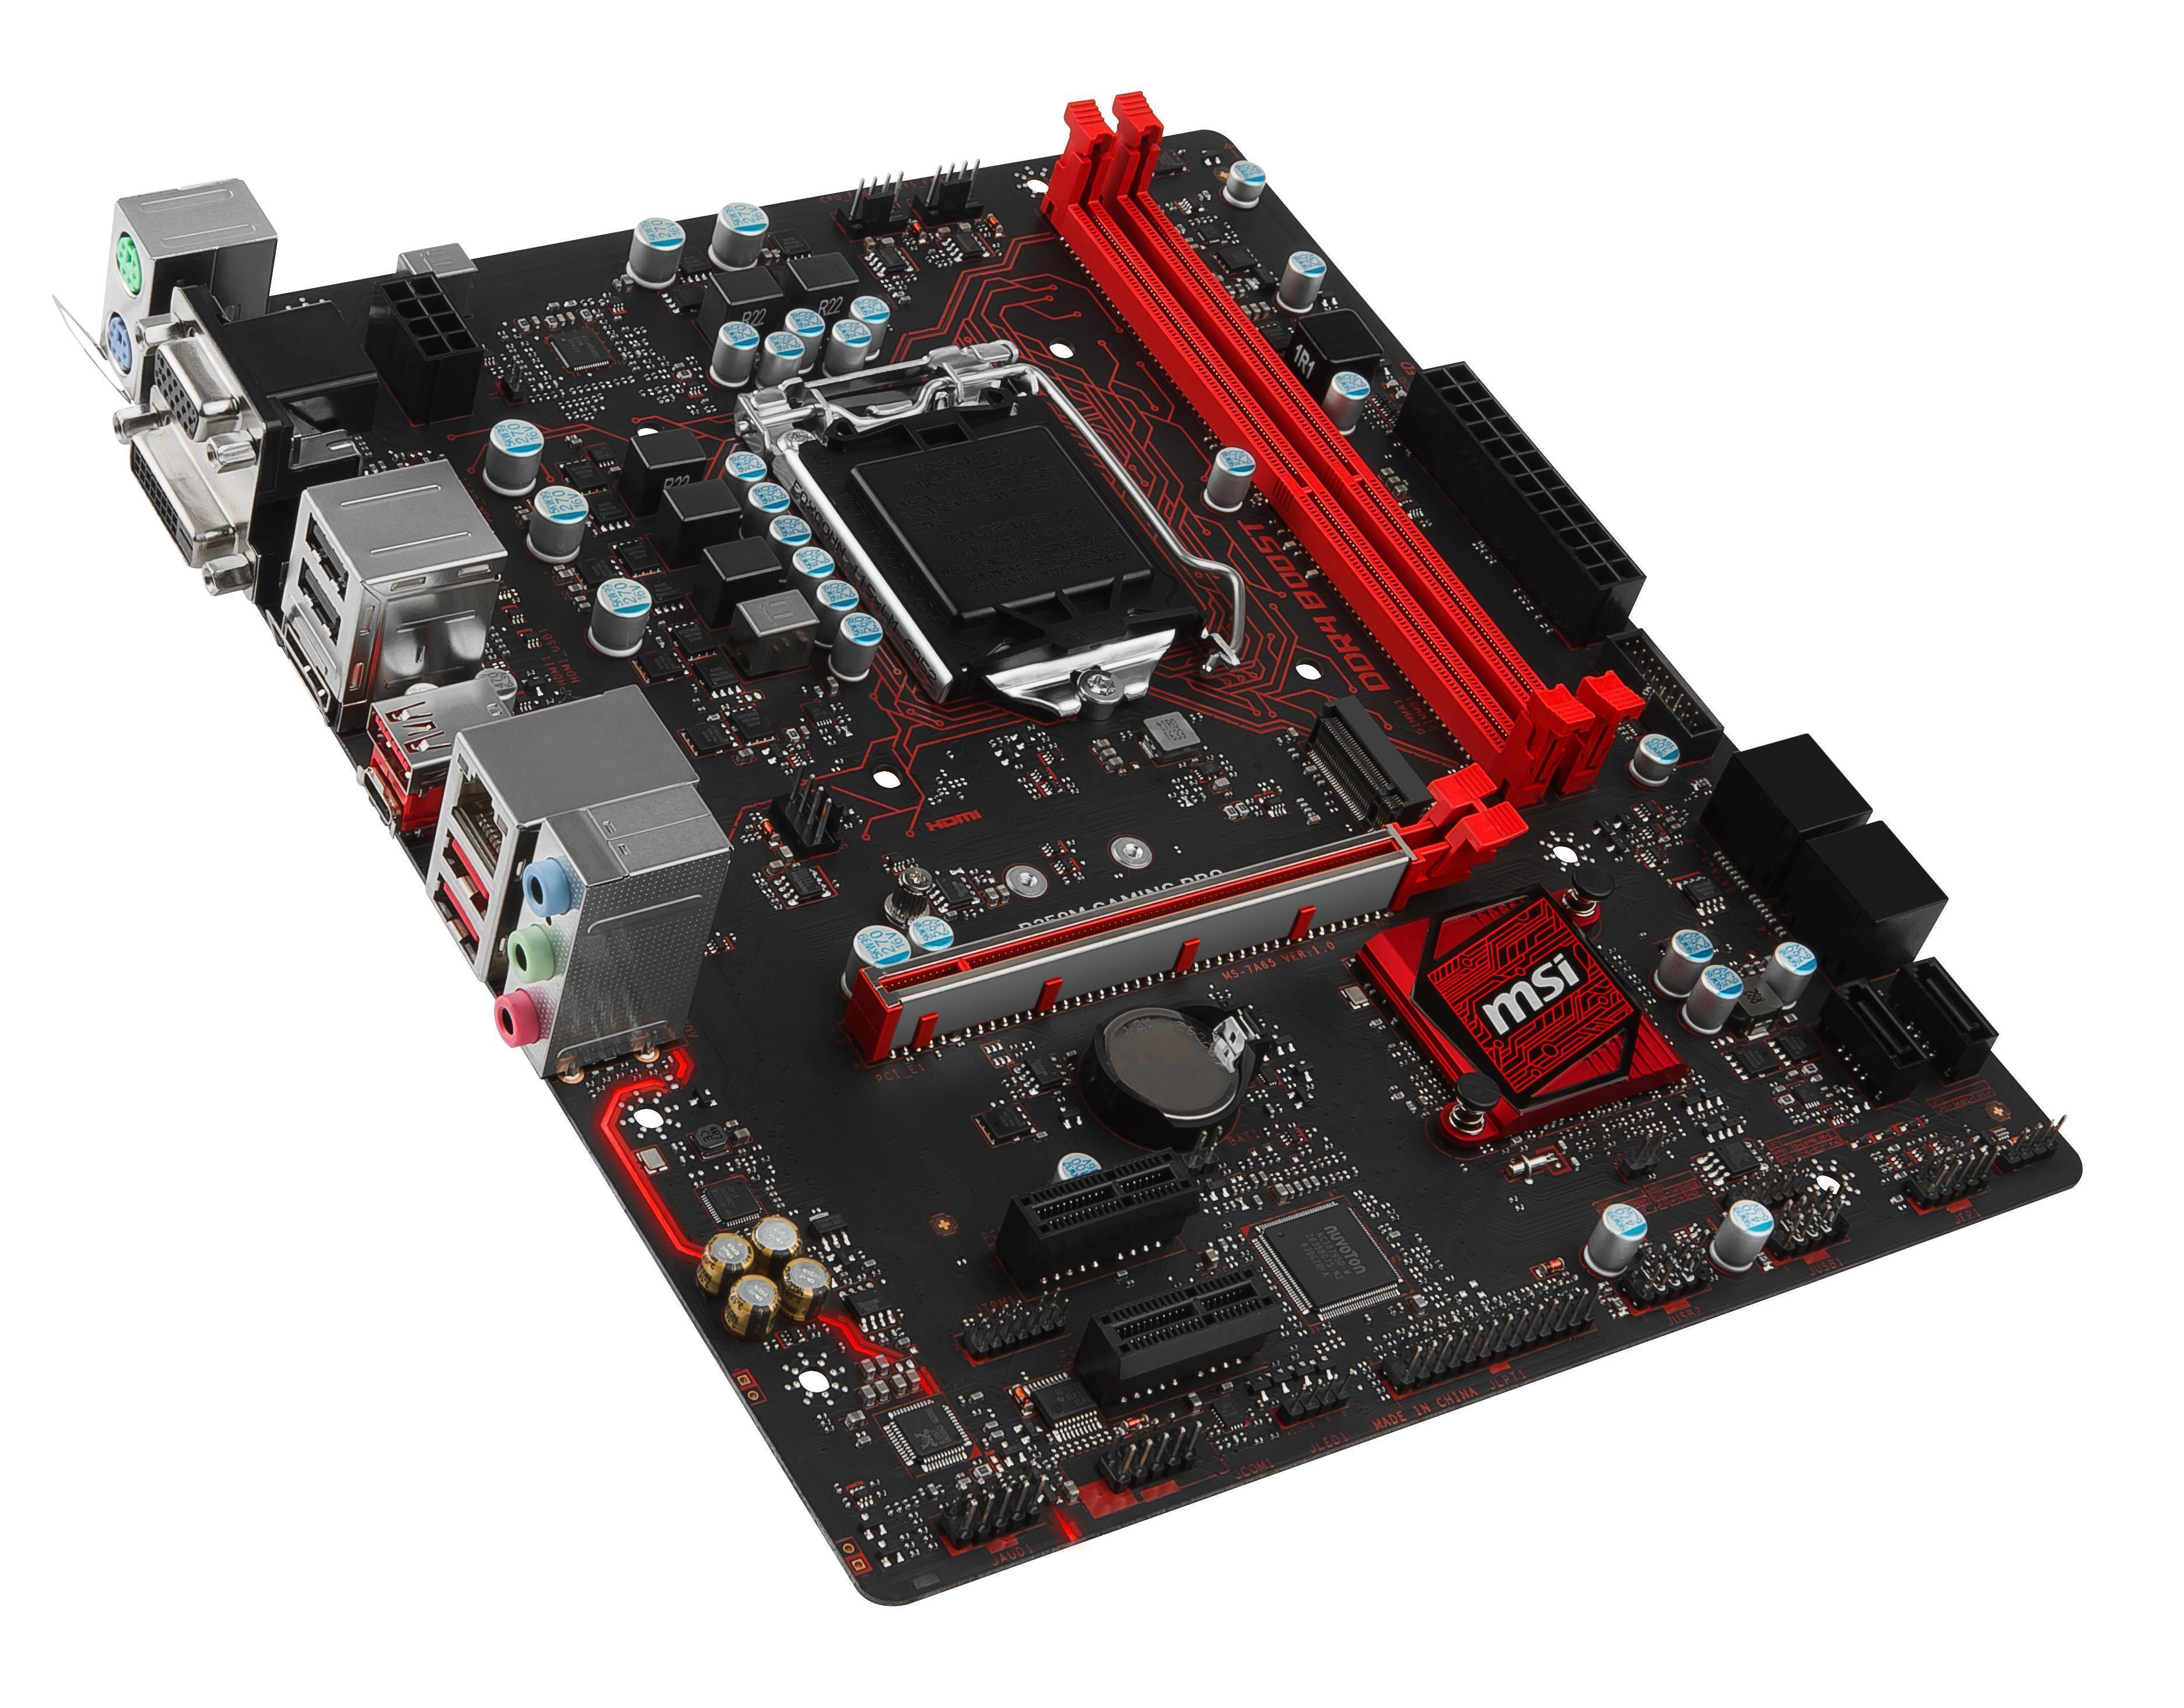 MSI B250M GAMING PRO Intel B250 Socket 1151 Motherboard